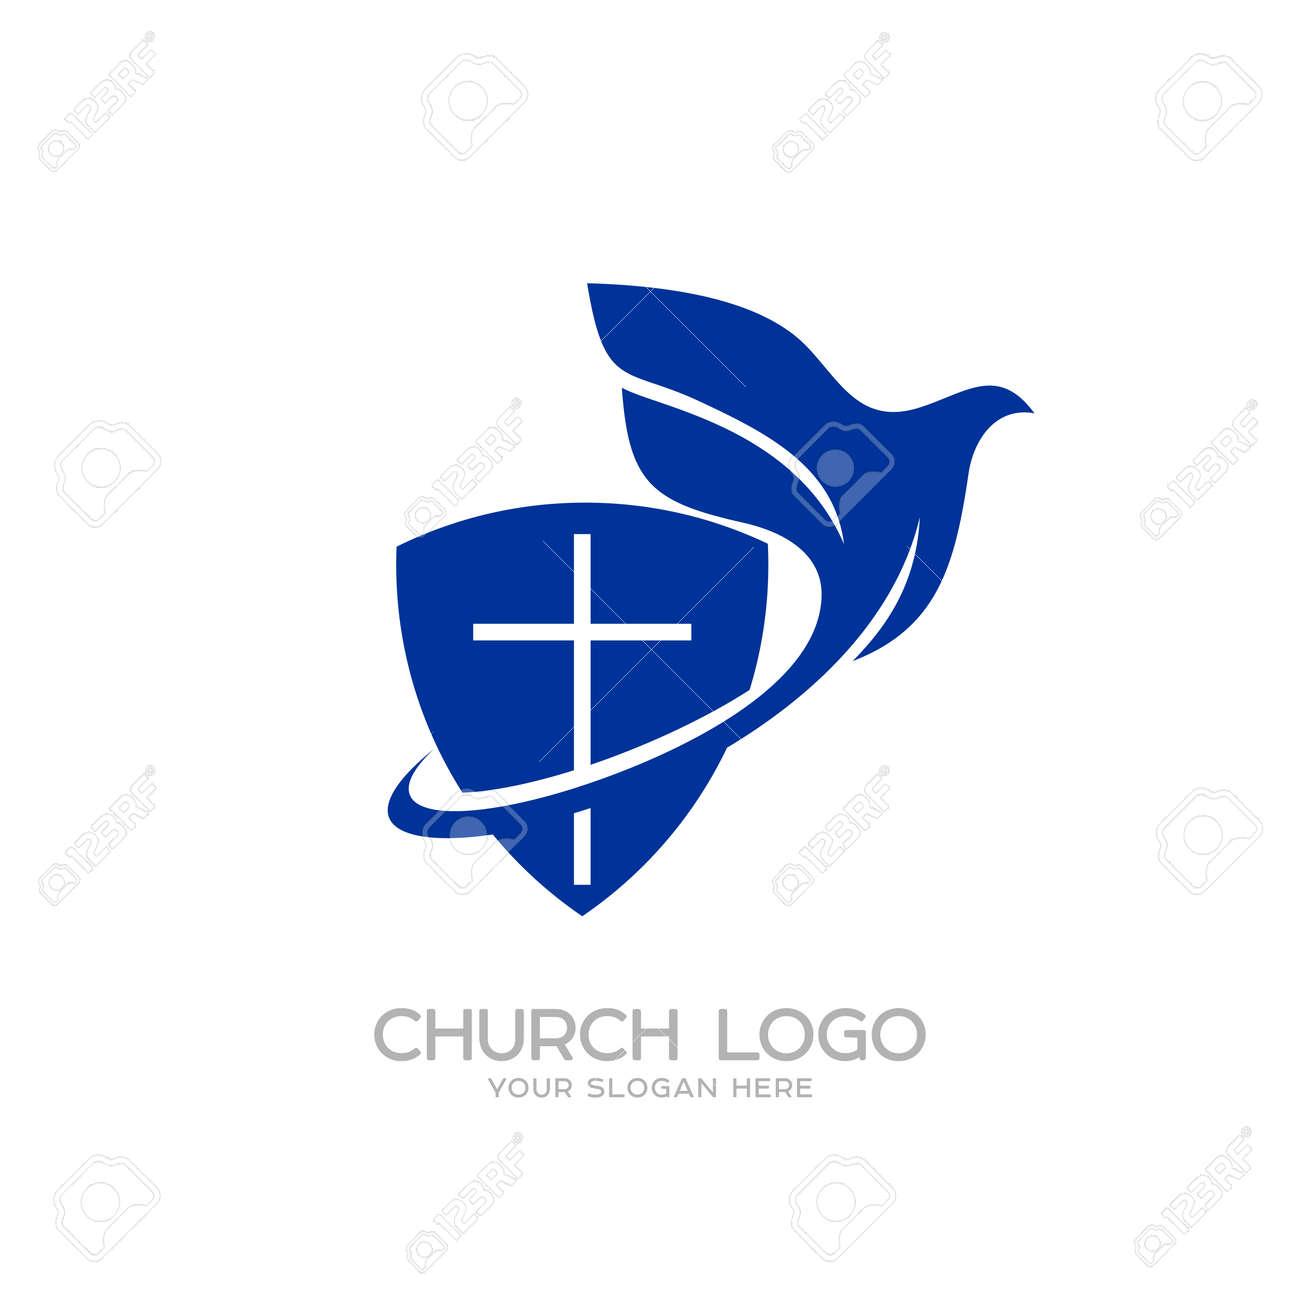 Church Logo Christian Symbols The Shield Of Faith And The Holy